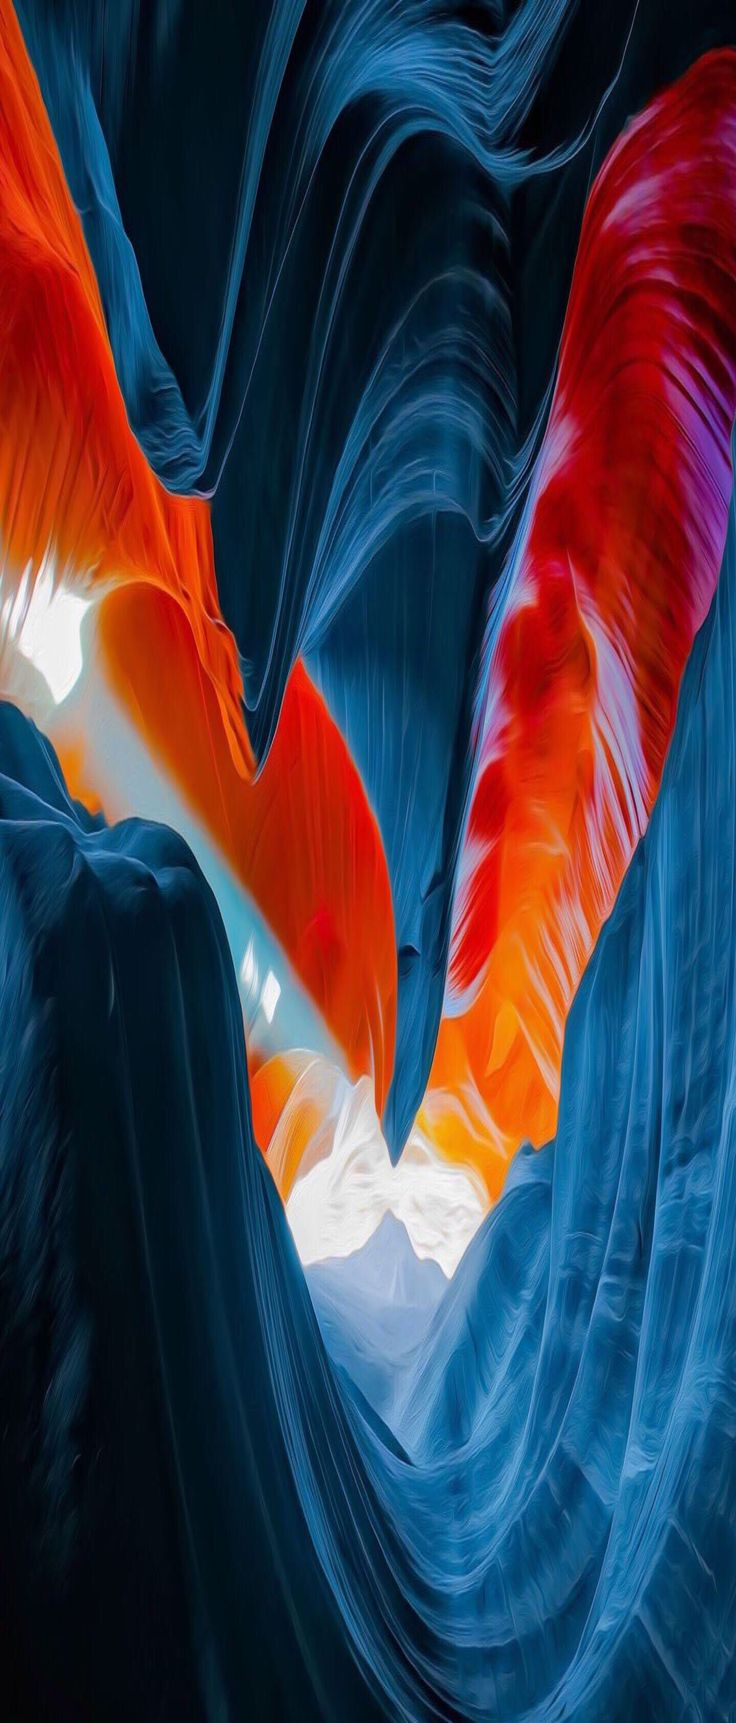 blue, orange, texture, wallpaper, pattern, galaxy, colour, abstract, digital art, s8, walls, Samsung, galaxy s8